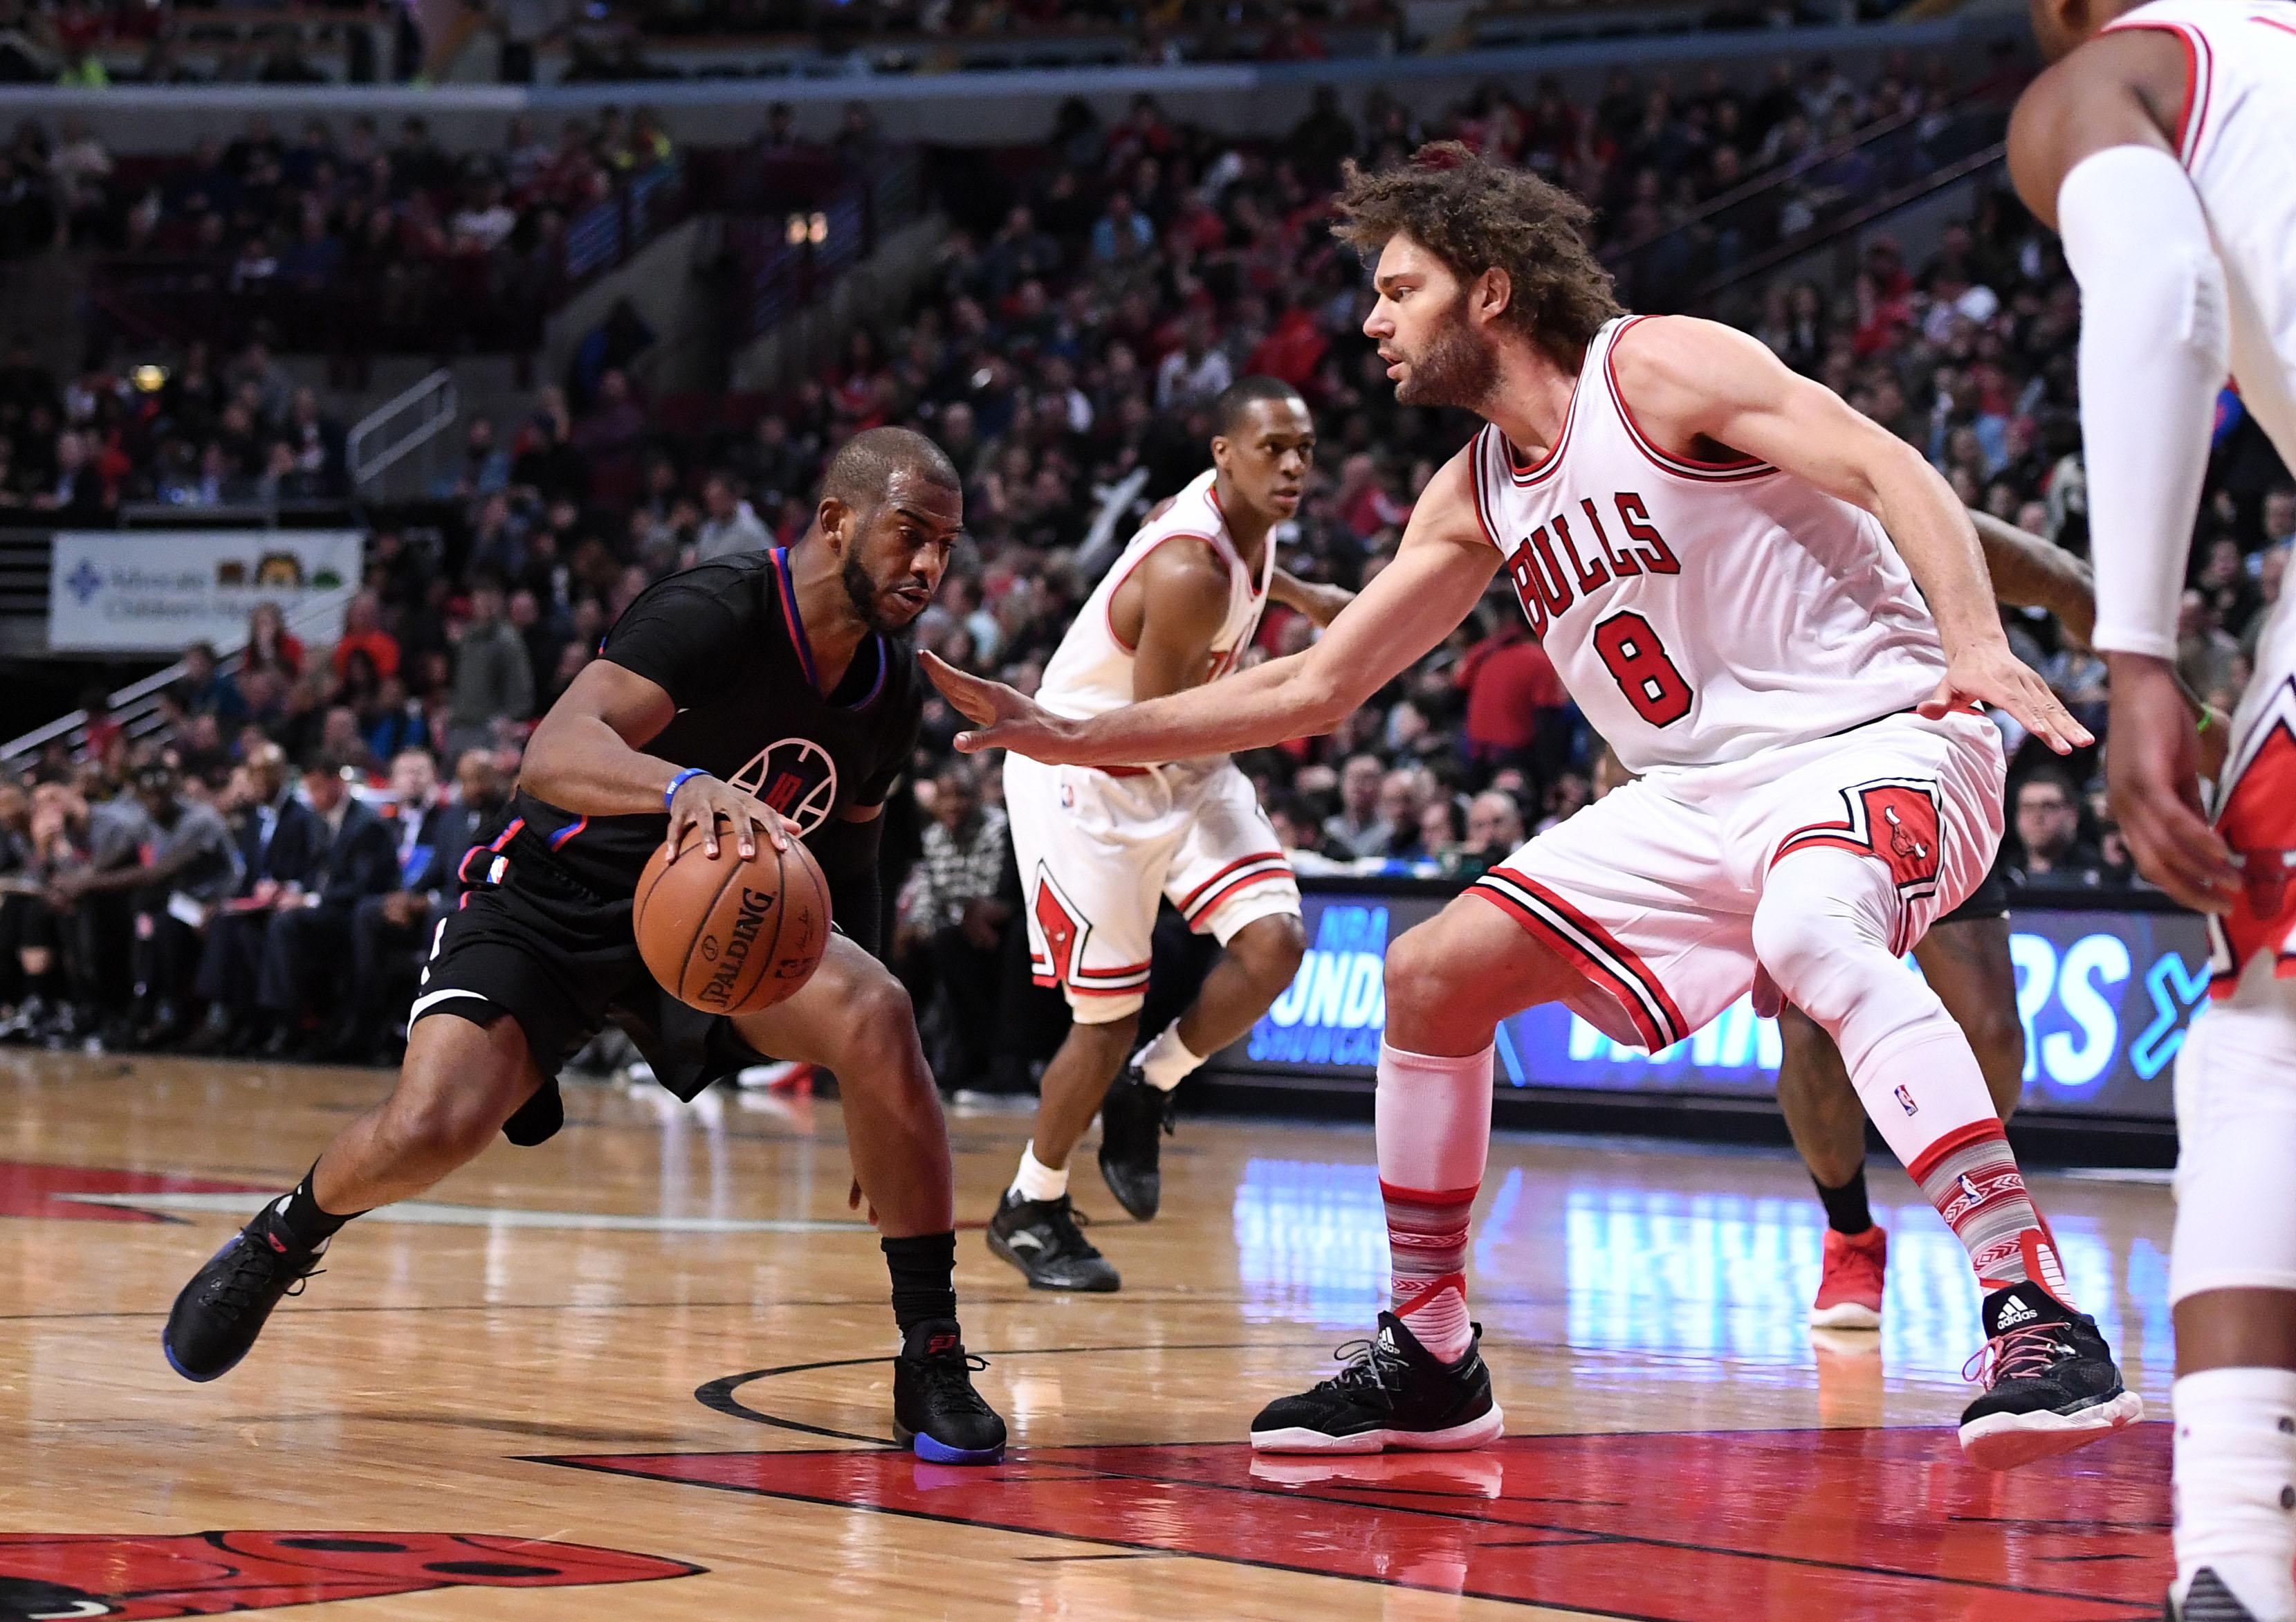 Clippers Vs Bulls Photo: Chicago Bulls Vs. Los Angeles Clippers Takeaways: Horrific